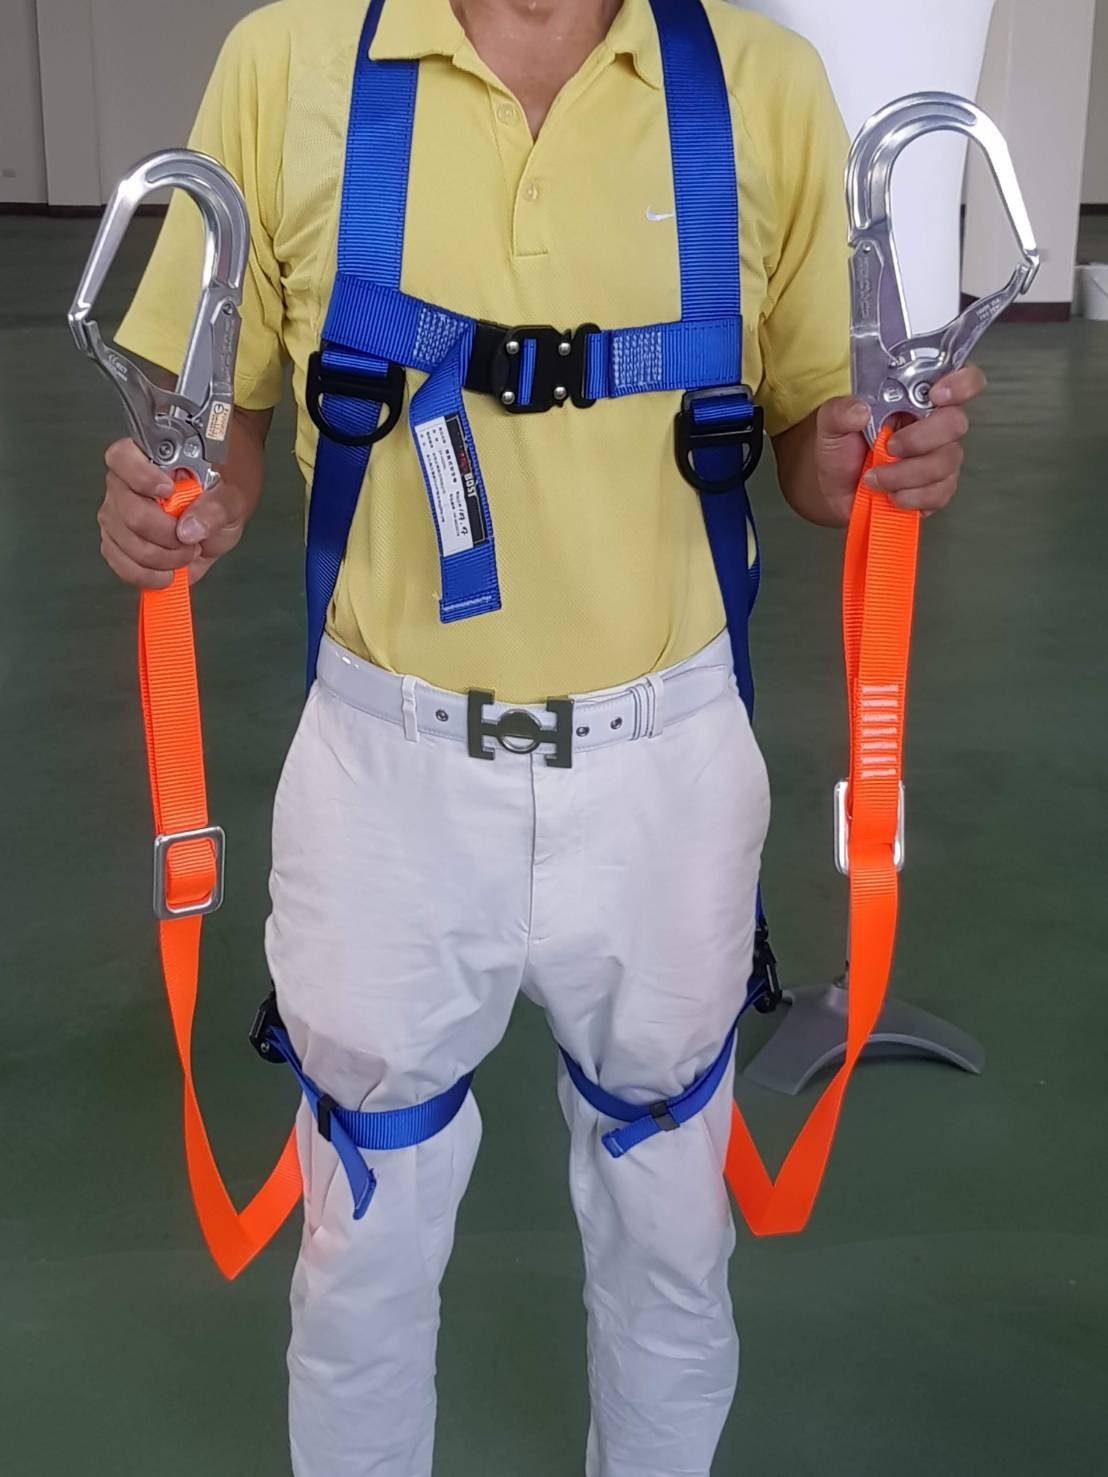 WIN 五金 台灣製 FKS BOST 快扣(雙織帶雙鋁大鉤) 背負式安全帶 落傘式安全帶 通過CNS14253檢驗